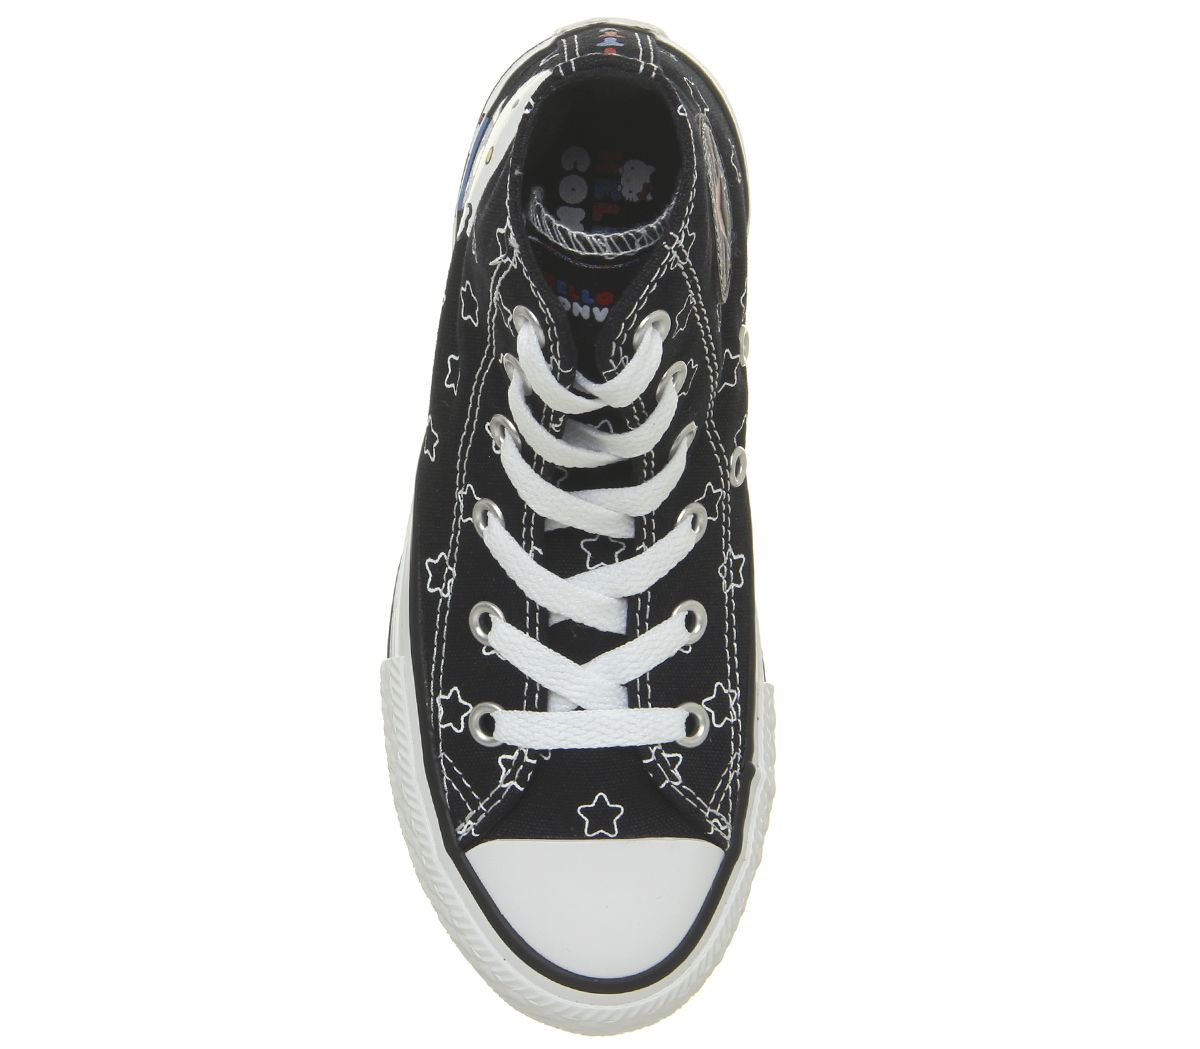 8891e60a286a5e Kids Converse All Star Hi Mid Sizes Black White Directoire Blue ...